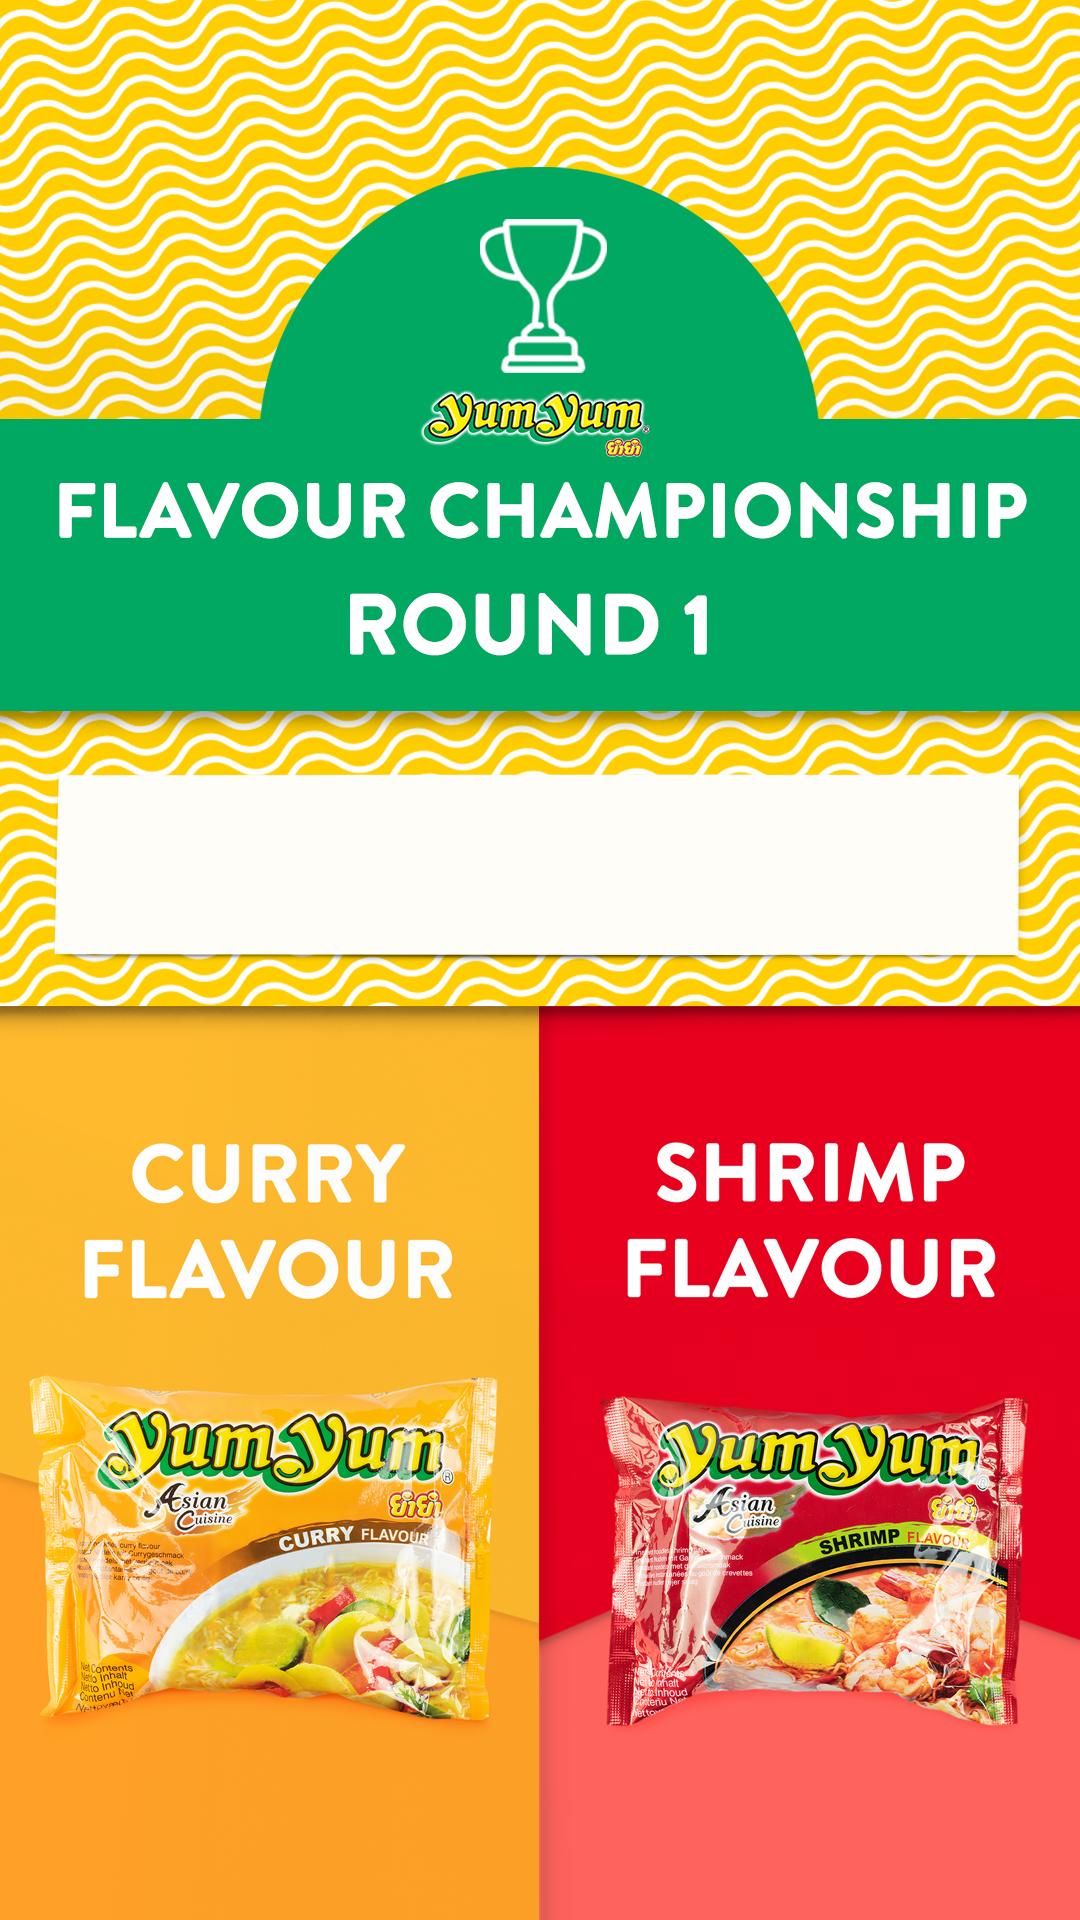 flavour poll (RPUND 1 - curry vs shrimp).png